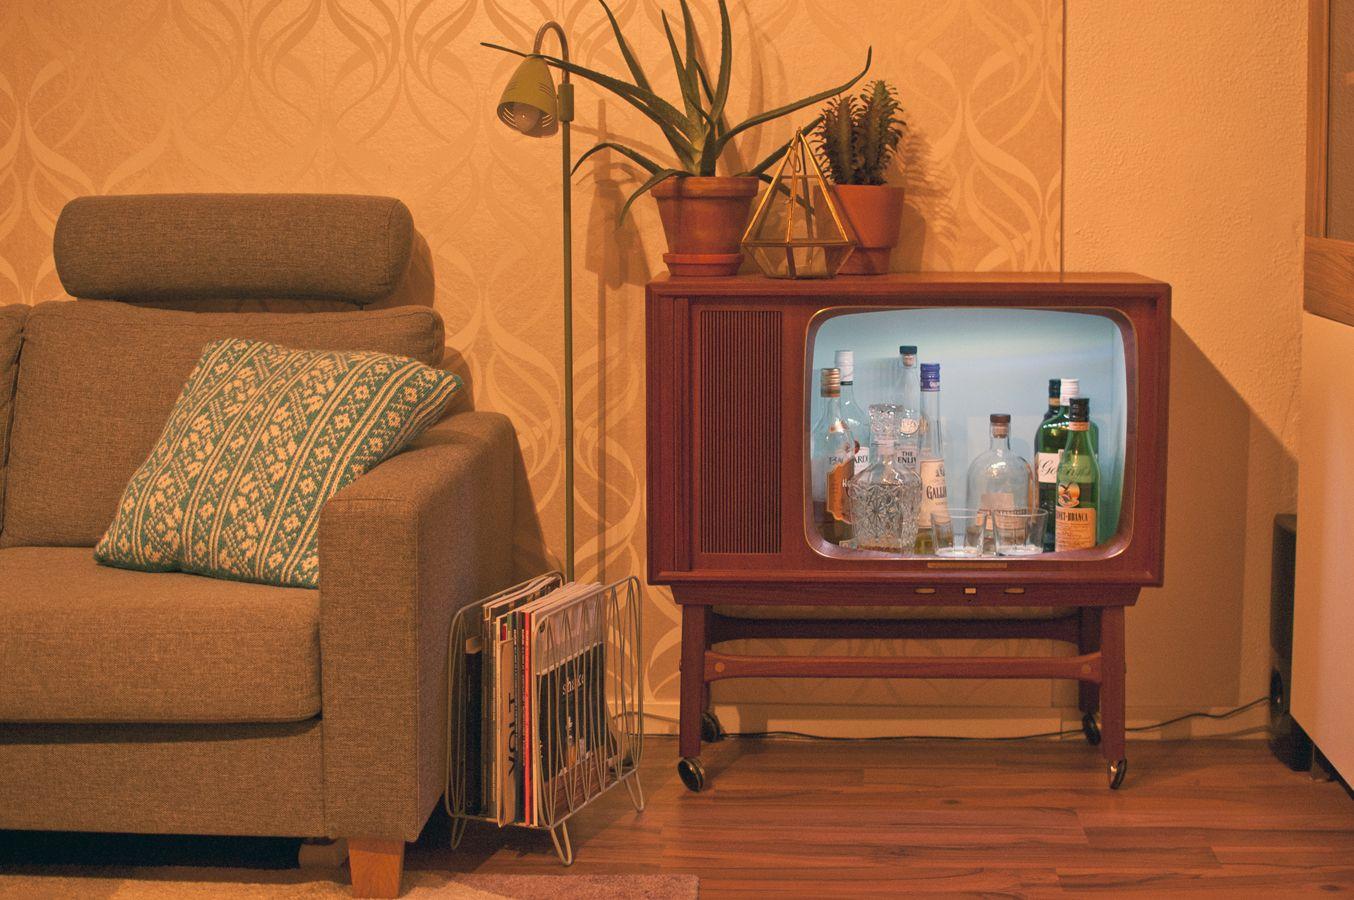 Old Tv I Repurposed As A Liquor Cabinet Home Decor Mini Bar Funky Decor